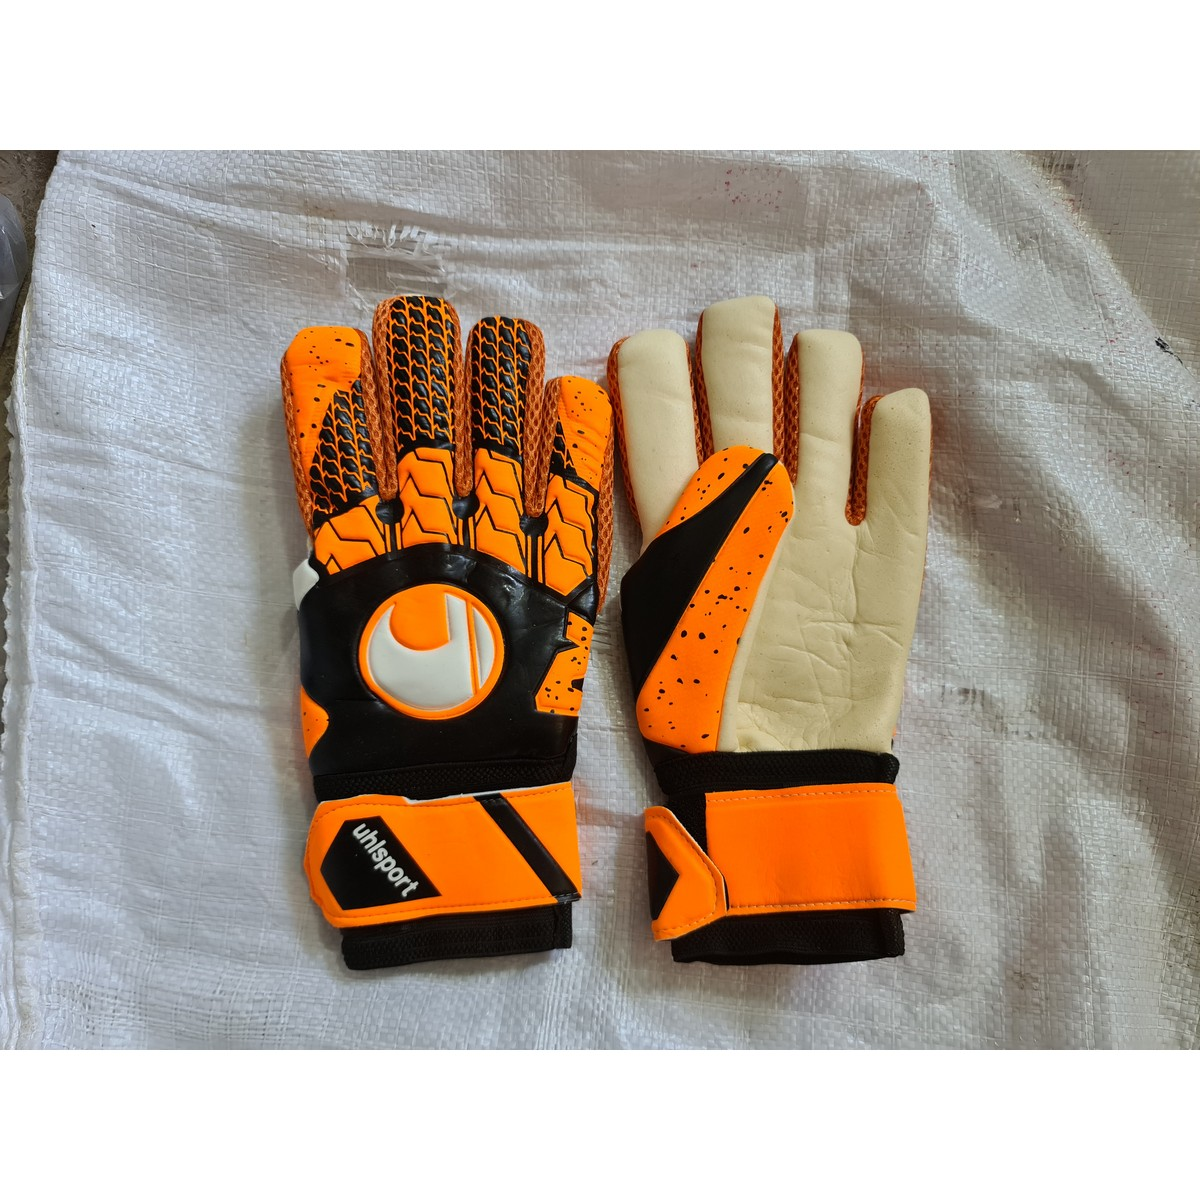 Foot ball goal keeper gloves High quality